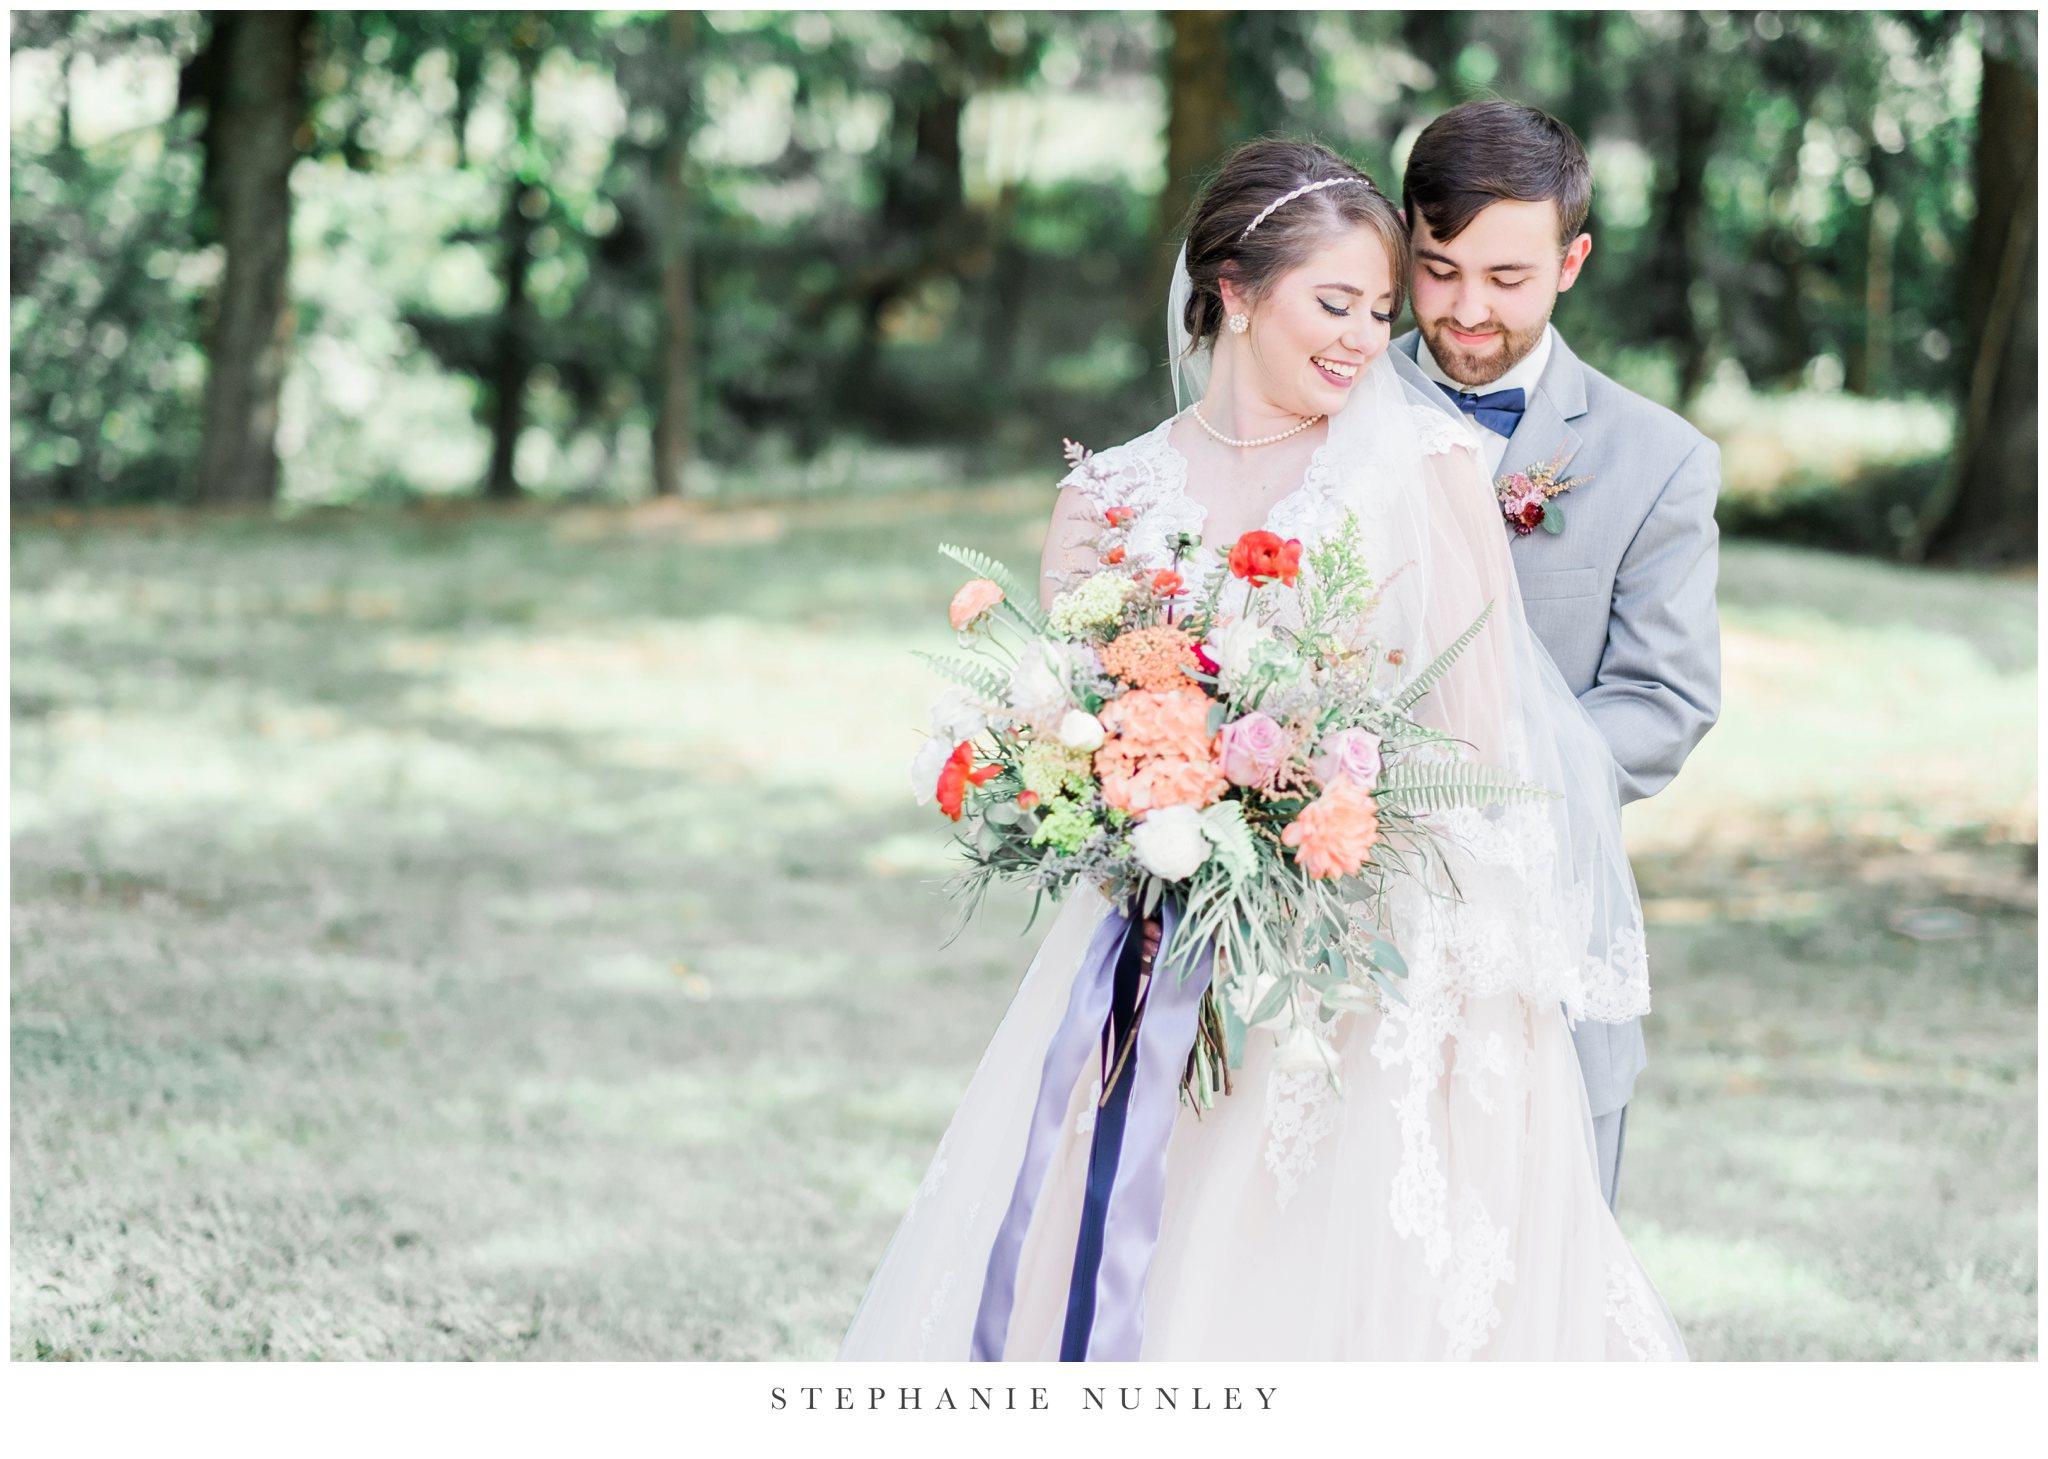 arkansas-wedding-with-lush-wildflower-bouquet-0059.jpg